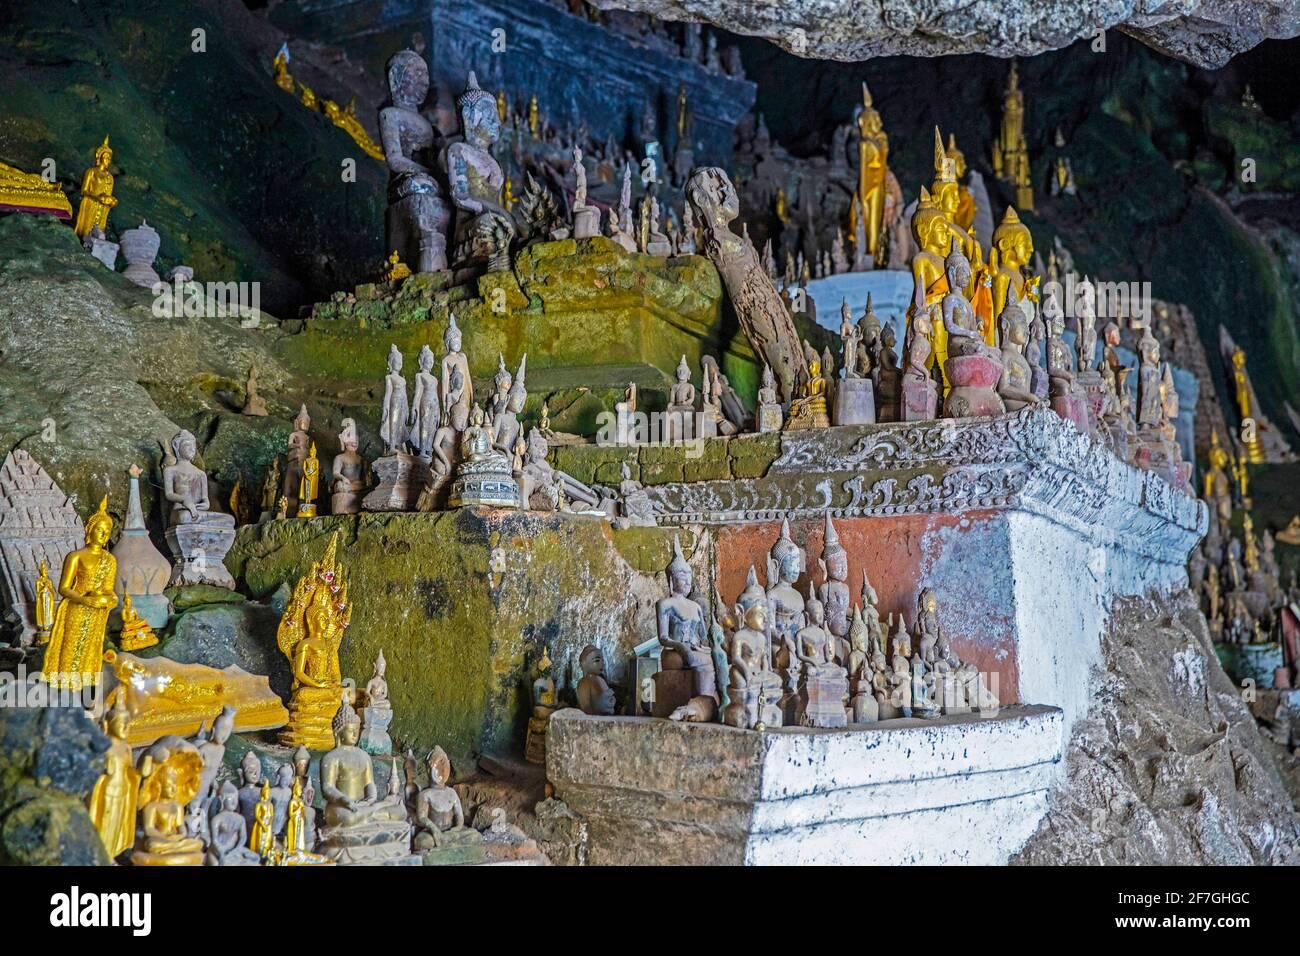 Buddha-Statuen in der unteren Höhle / Tham Ting bei den Pak Ou Höhlen entlang des Mekong Flusses in der Nähe von Luang Phabang / Luang Prabang, Laos Stockfoto